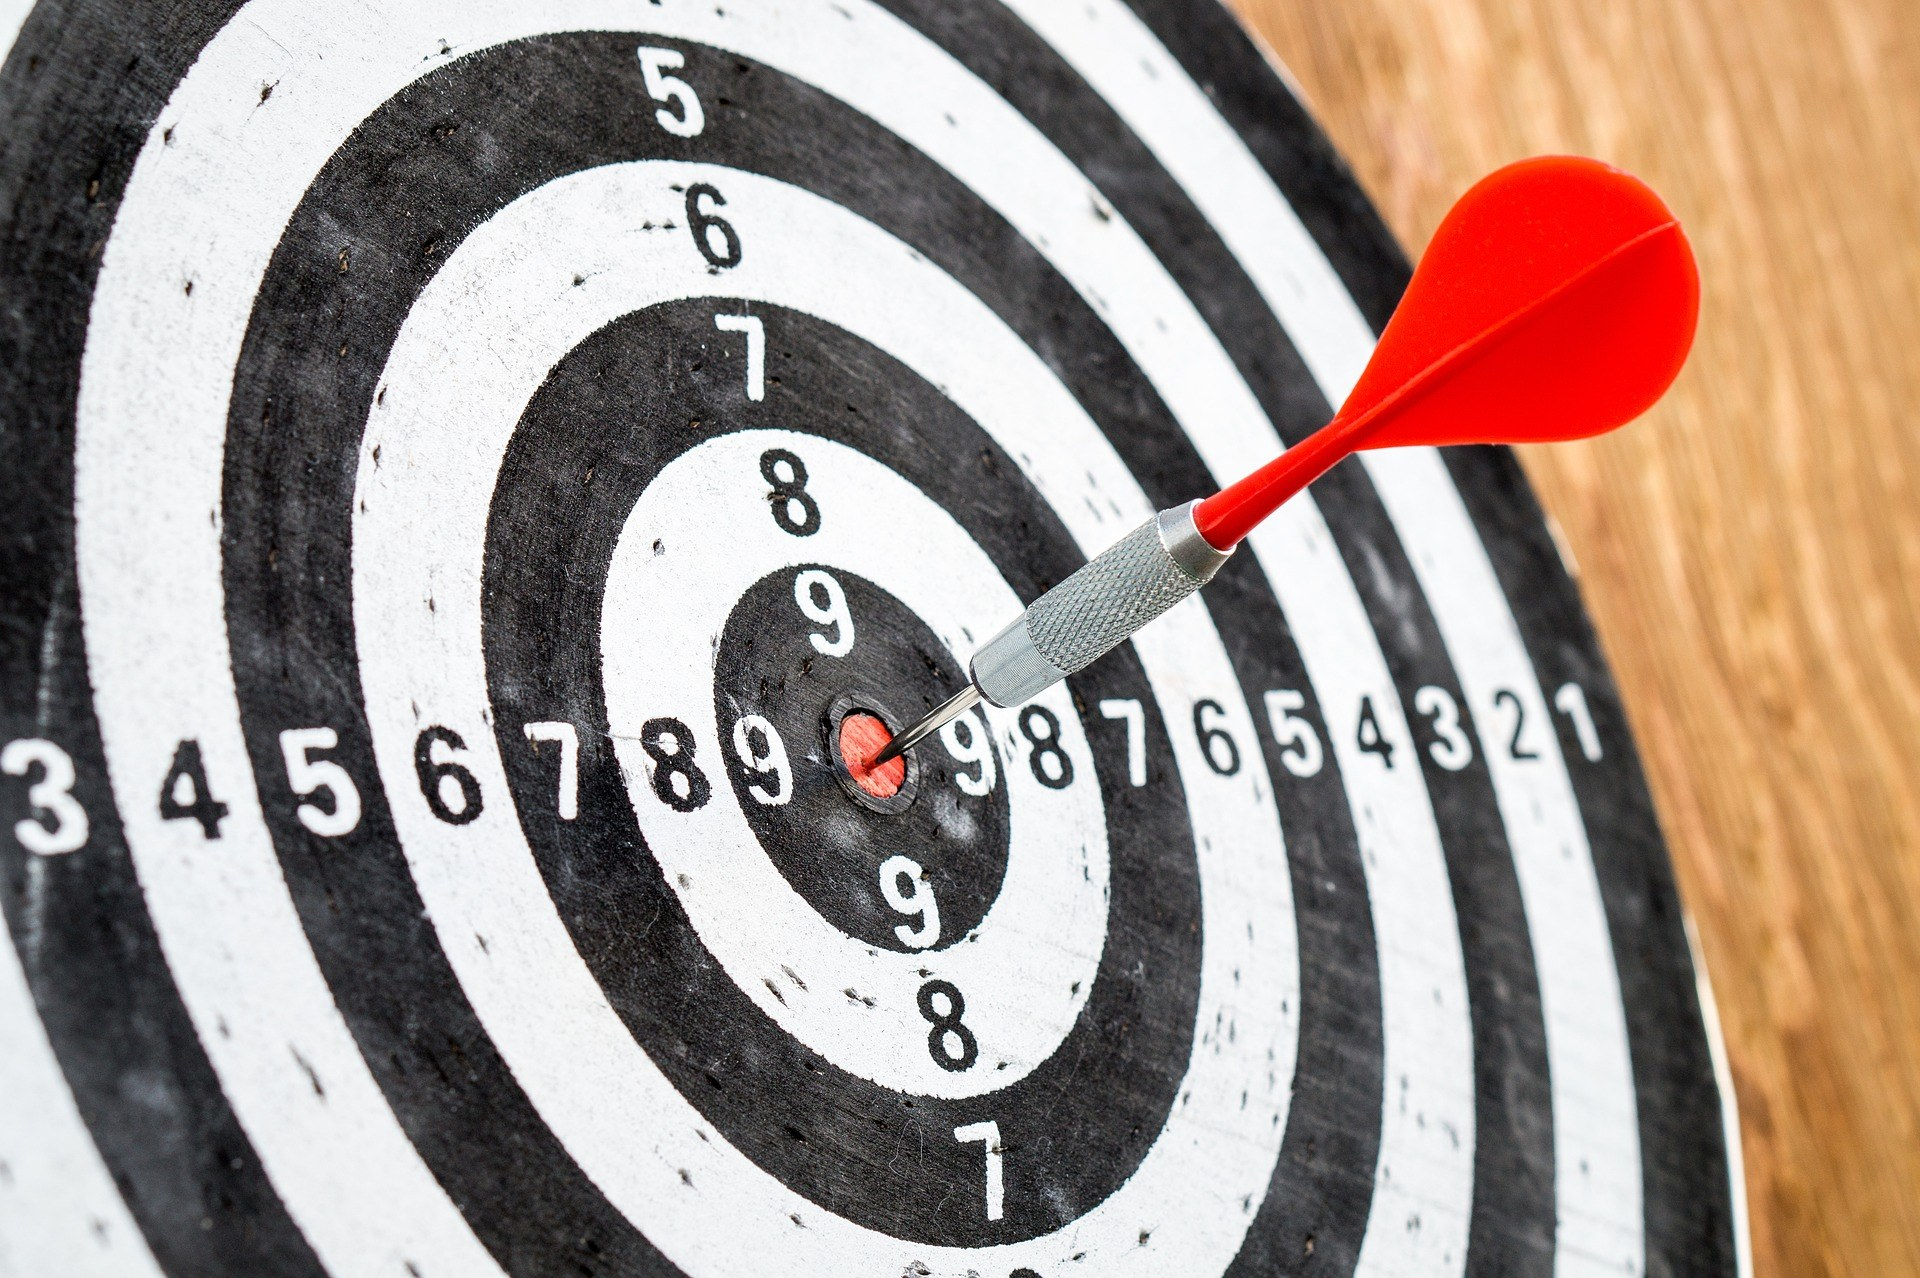 competitive advantage: target your niche